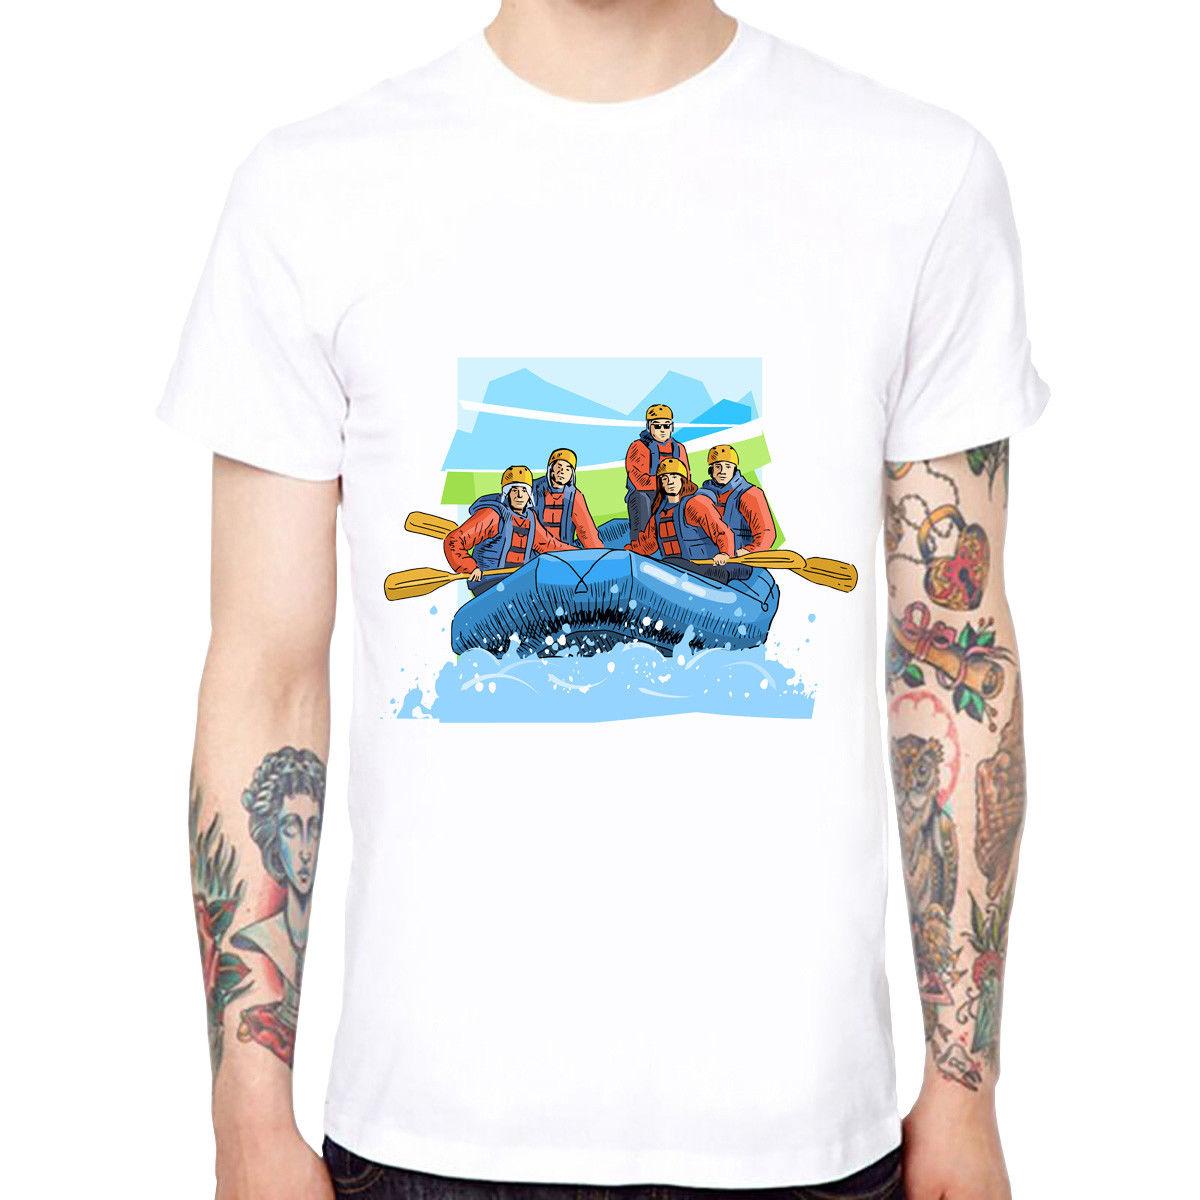 Water Rafting Mens Cotton Soft Funny Cool T-shirts Short Sleeve Tops Tee Tee Shirt Mens 2018 New Tee Shirts Sleeve Tops